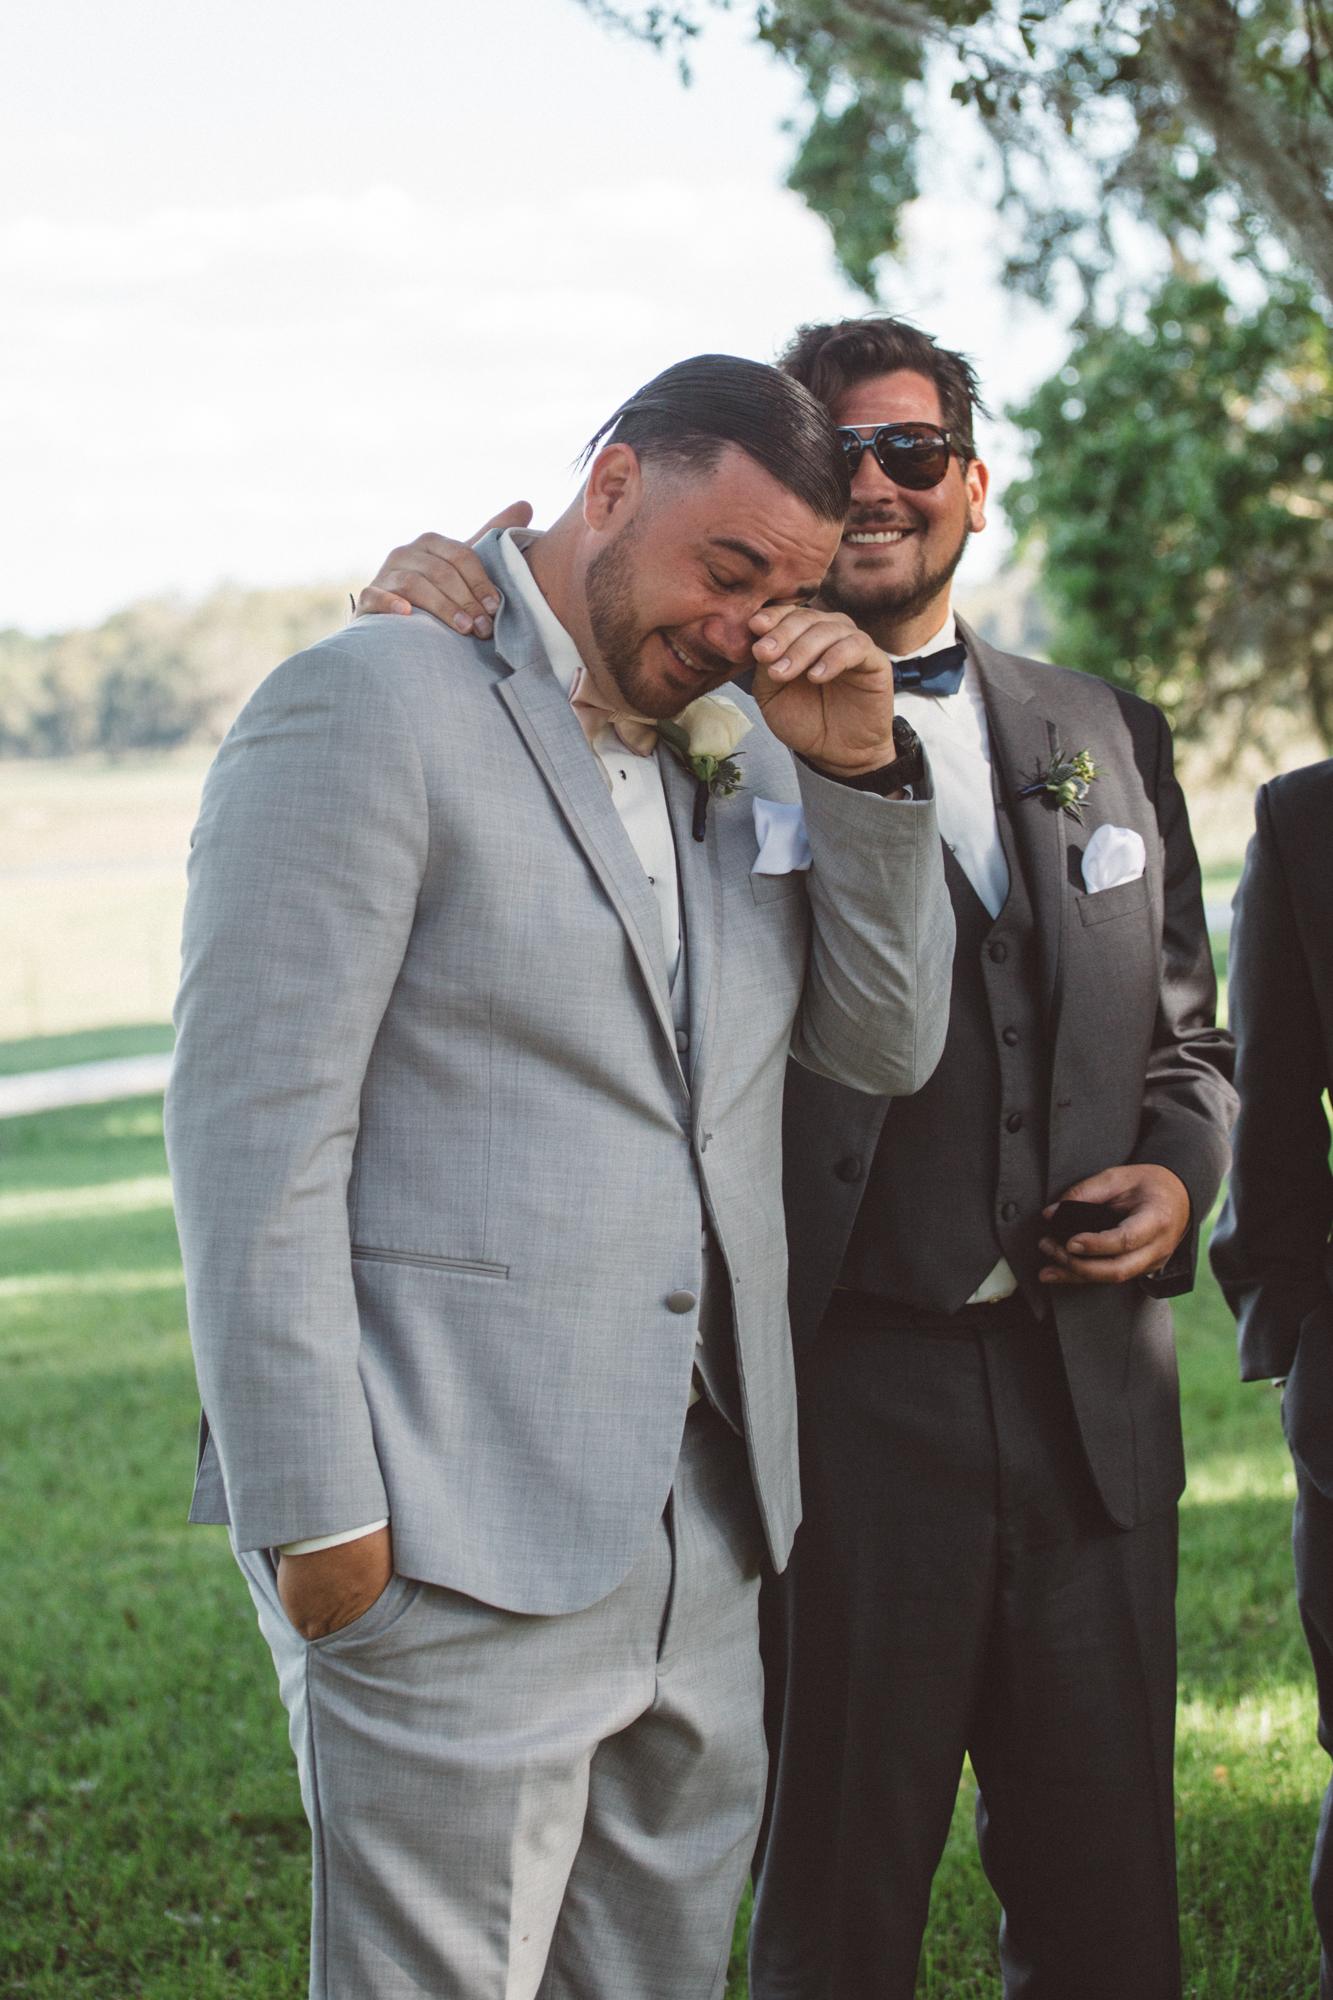 Lakeside Ranche Wedding Photographer-88.jpg